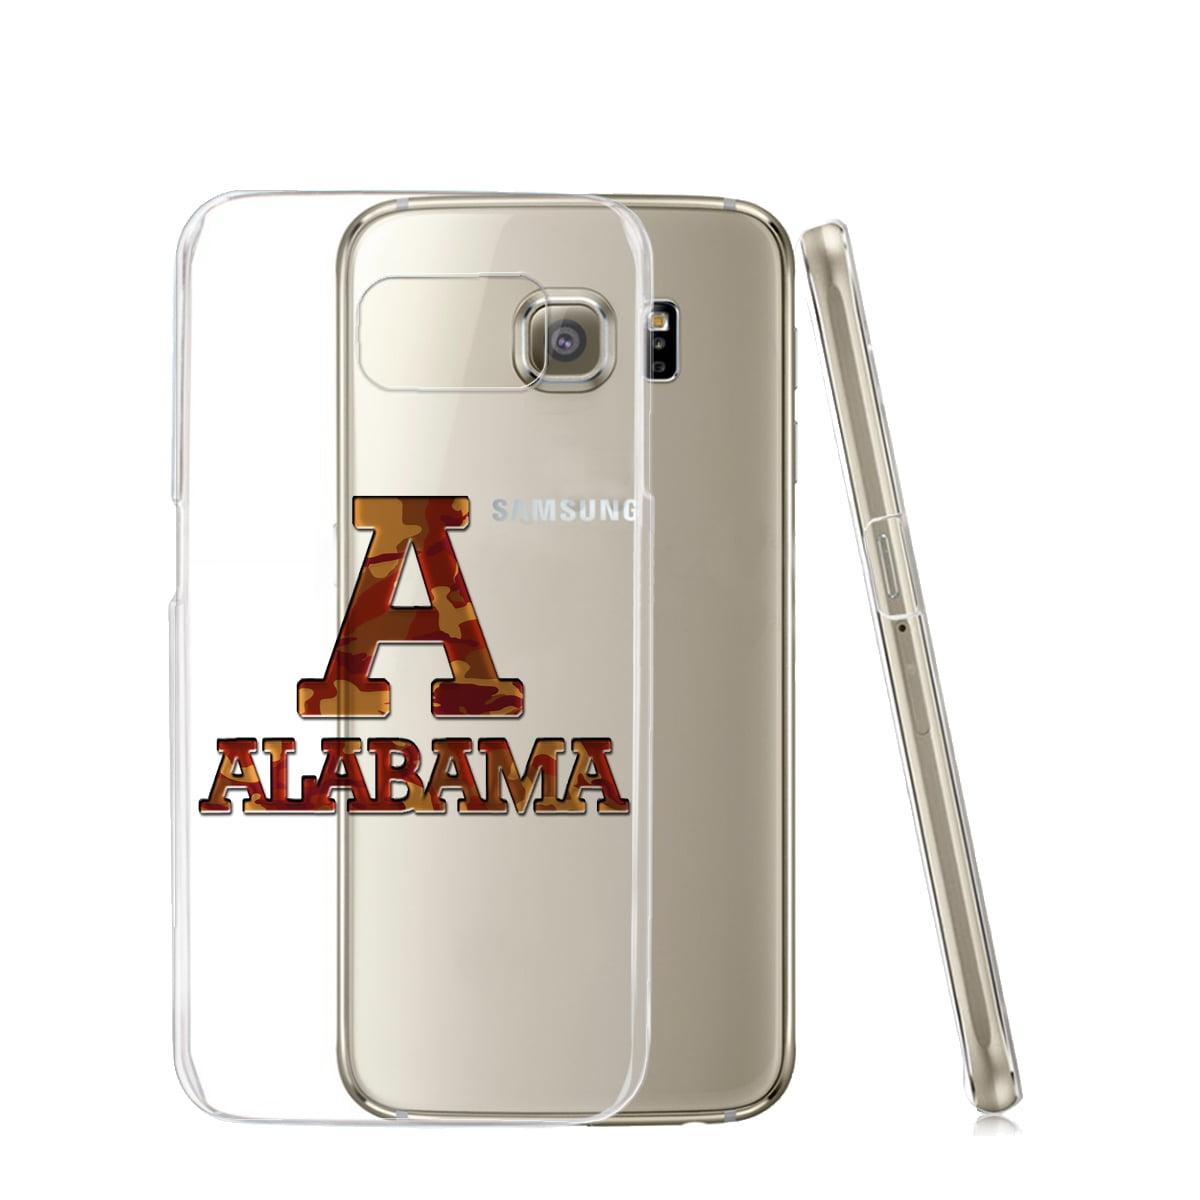 KuzmarK™ Samsung Galaxy S6 Edge Clear Cover Case - Alabama Red Camouflage